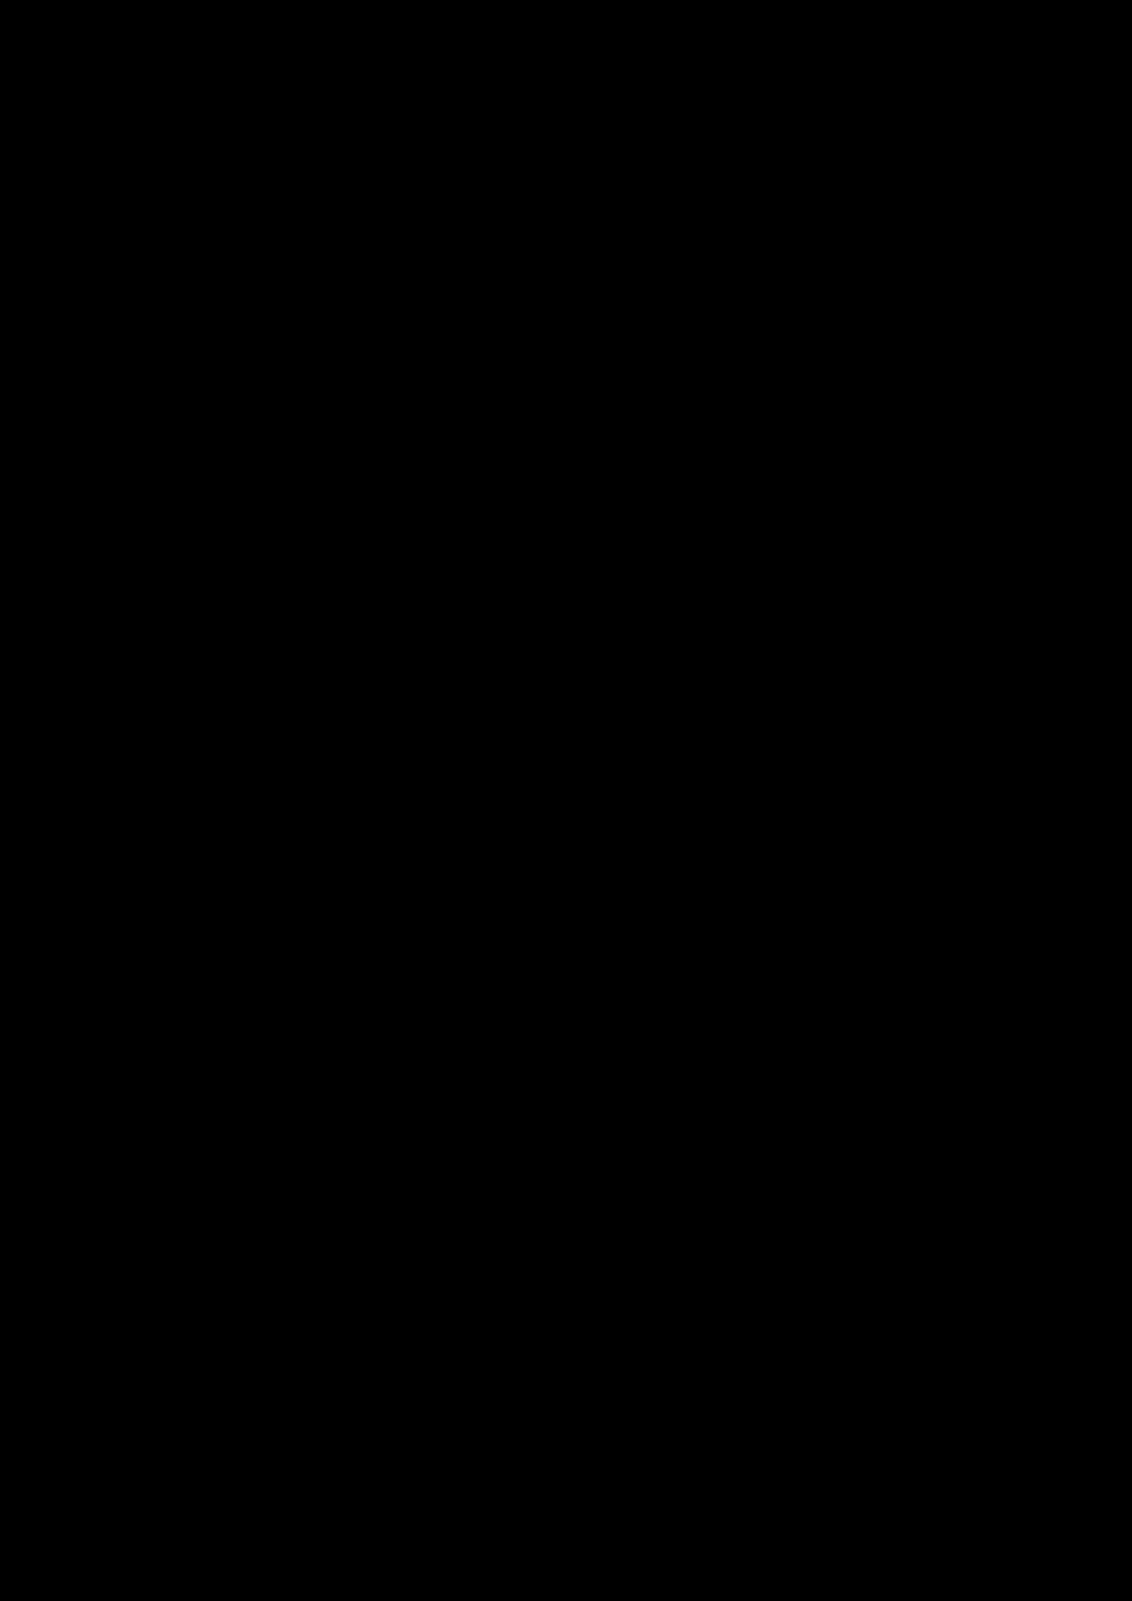 Belyiy sokol slide, Image 98